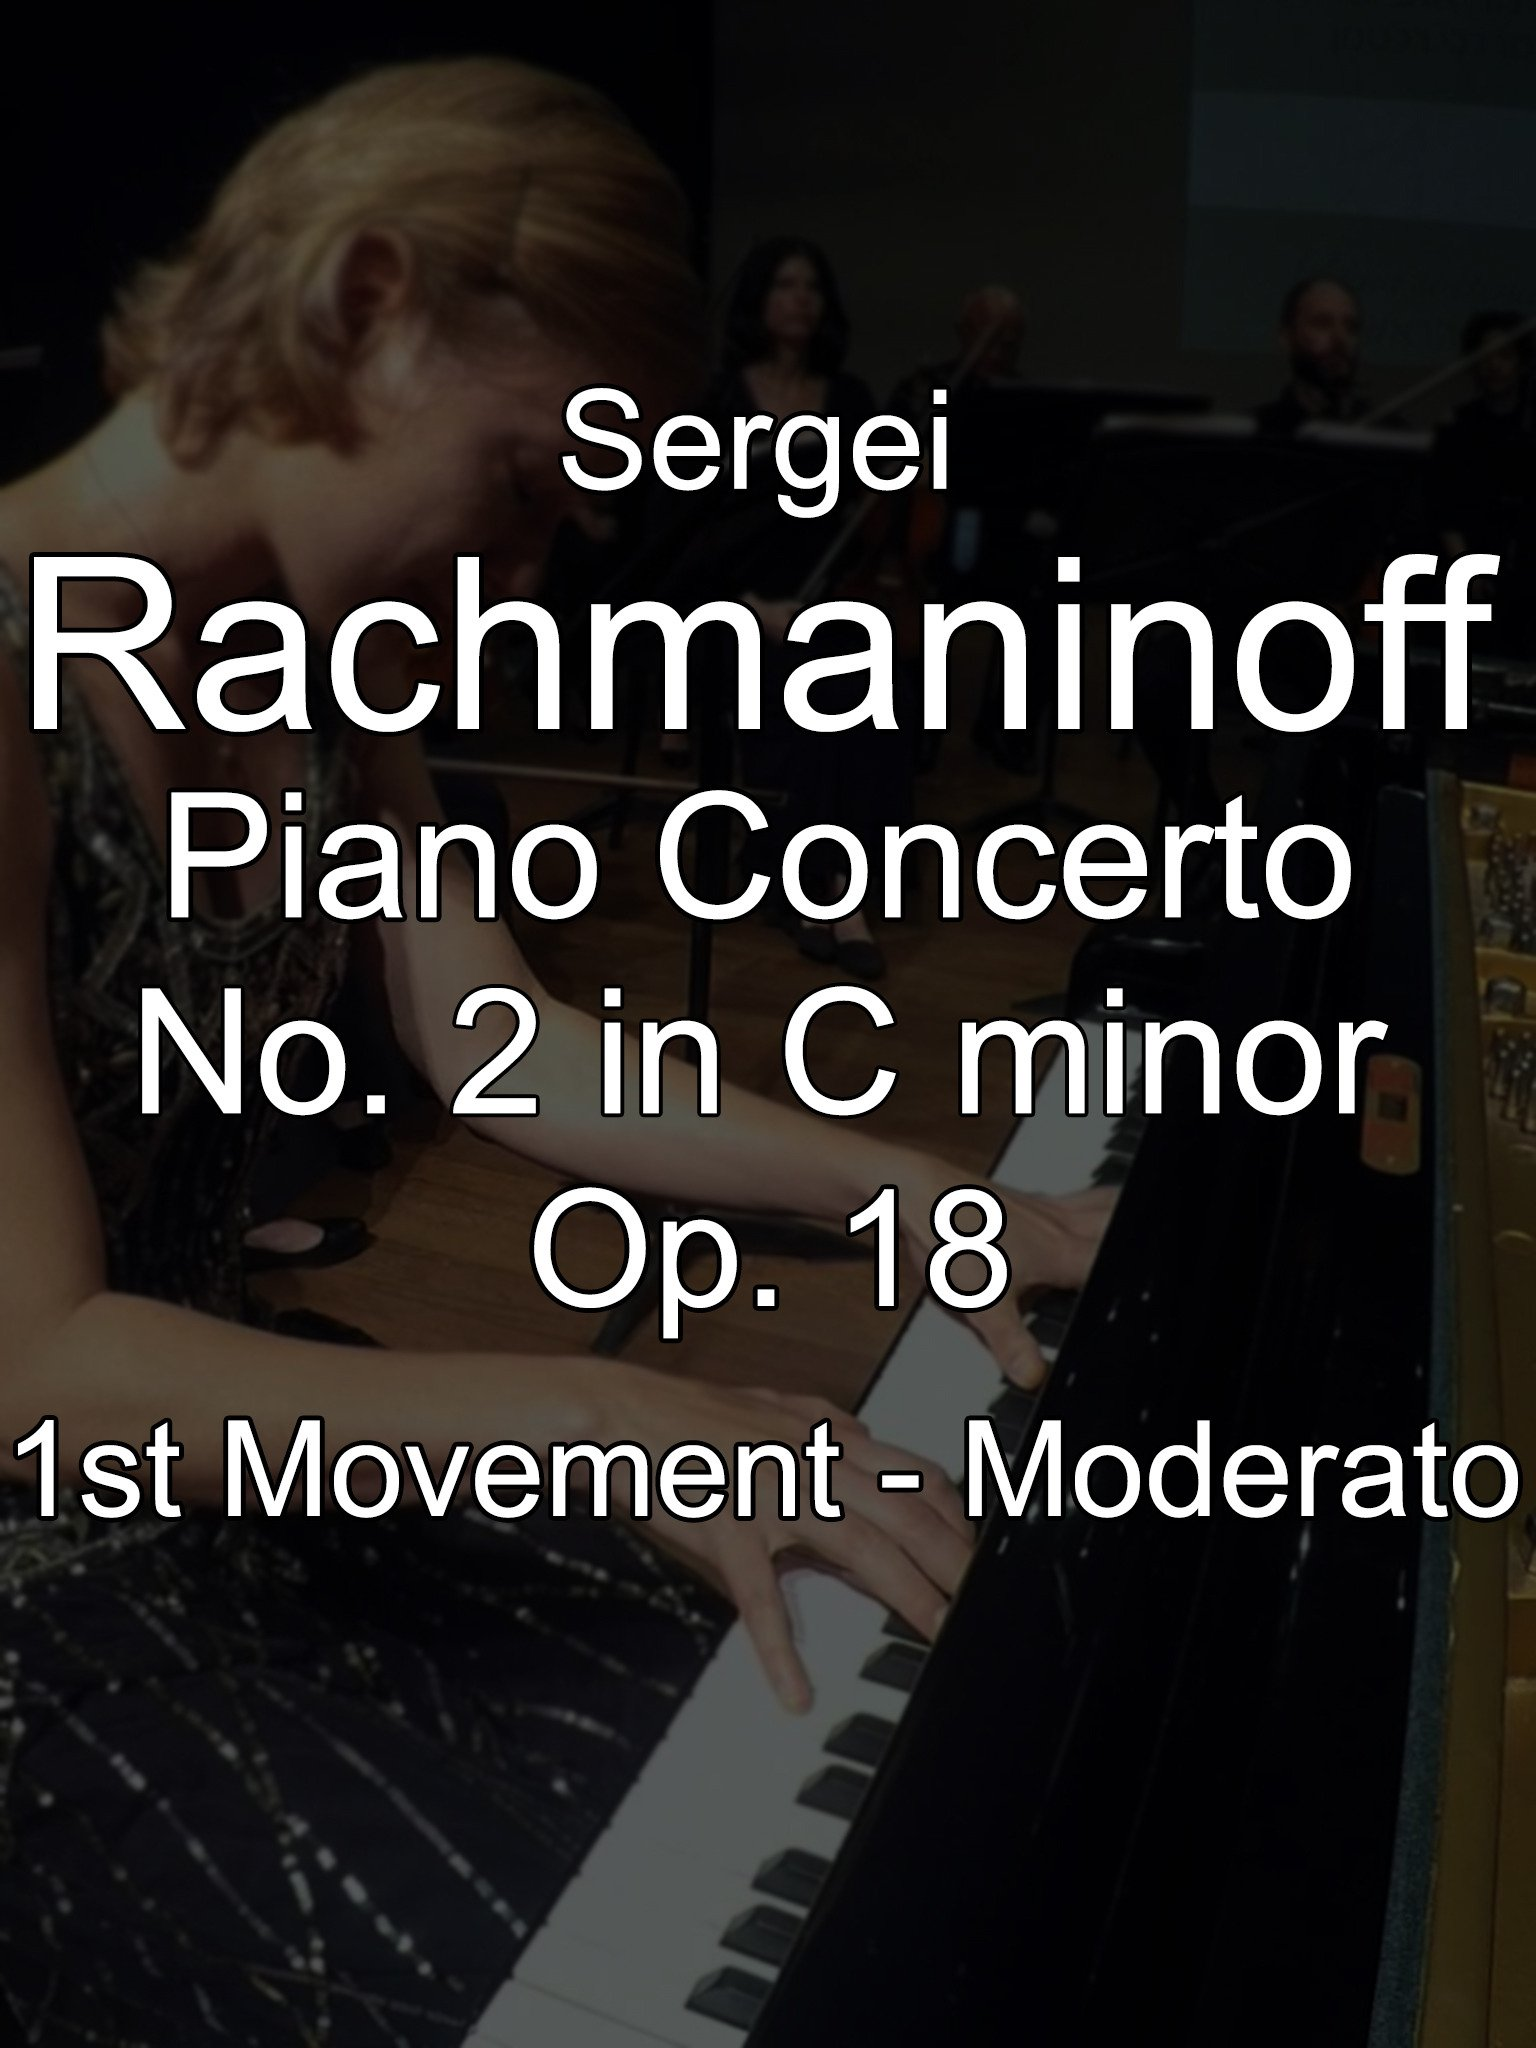 Sergei Rachmaninoff Piano Concerto No. 2 in C minor, Op. 18, 1st Movement on Amazon Prime Video UK